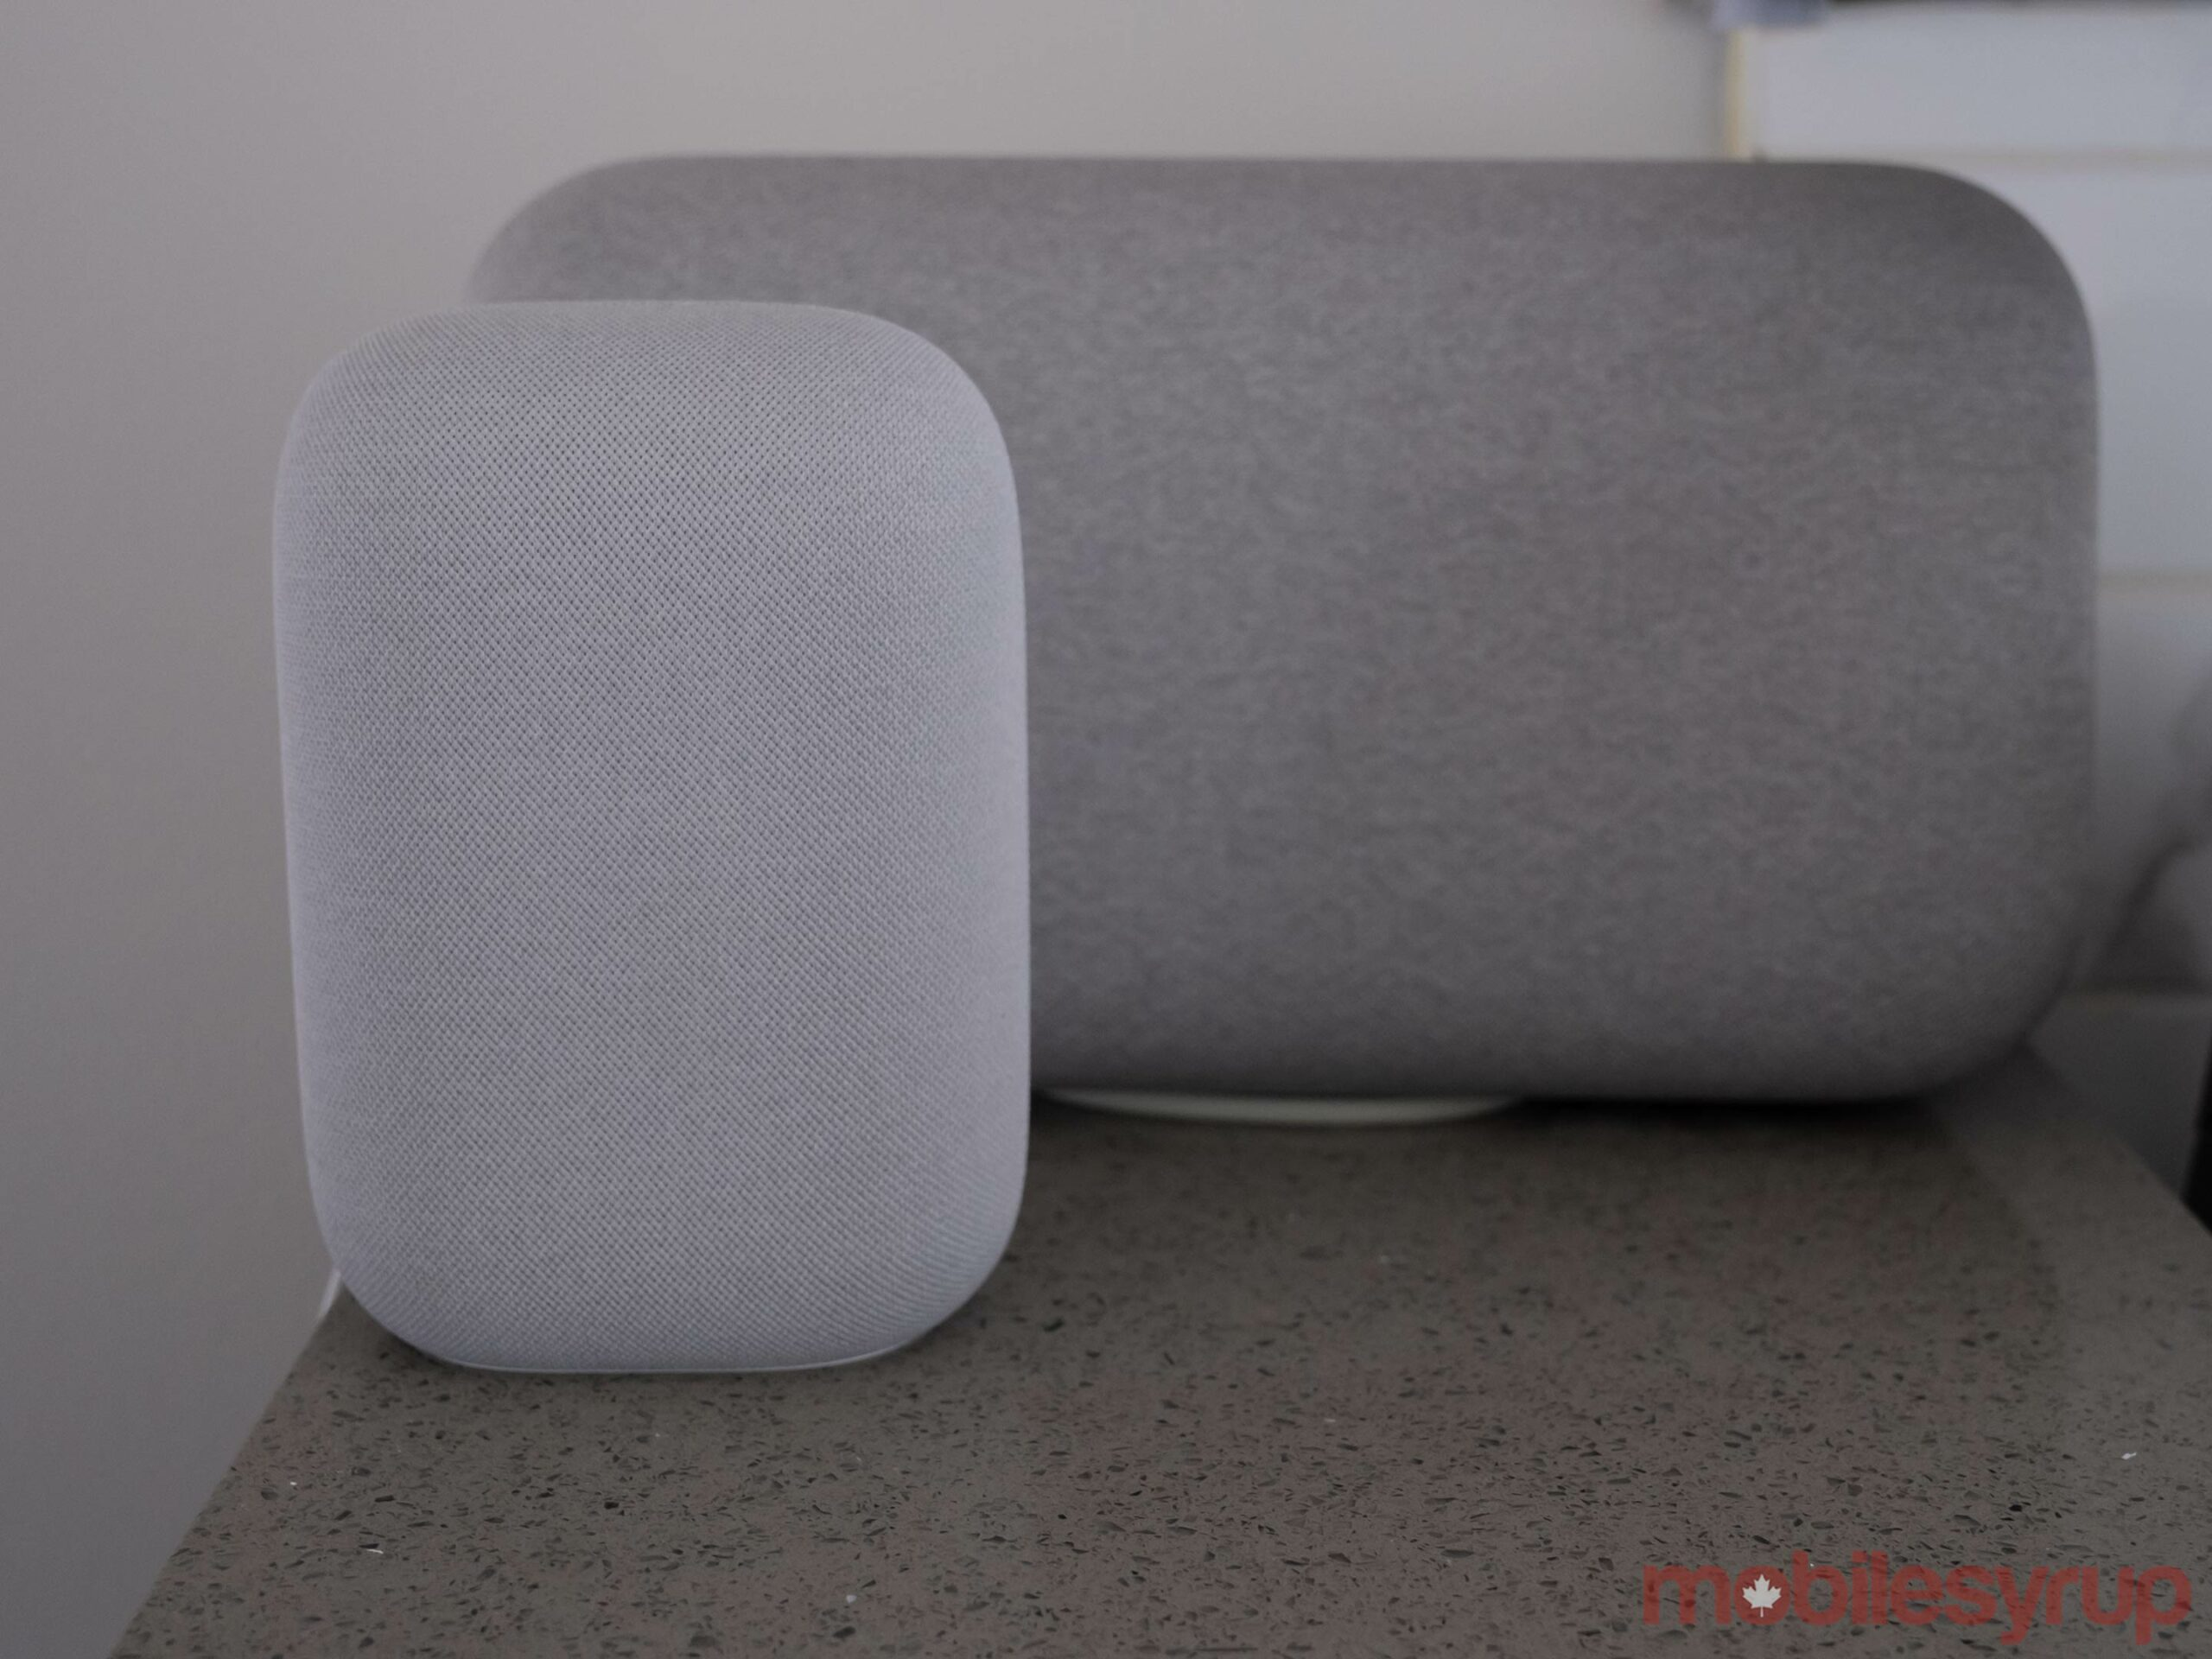 Nest Audio beside Google Home Max